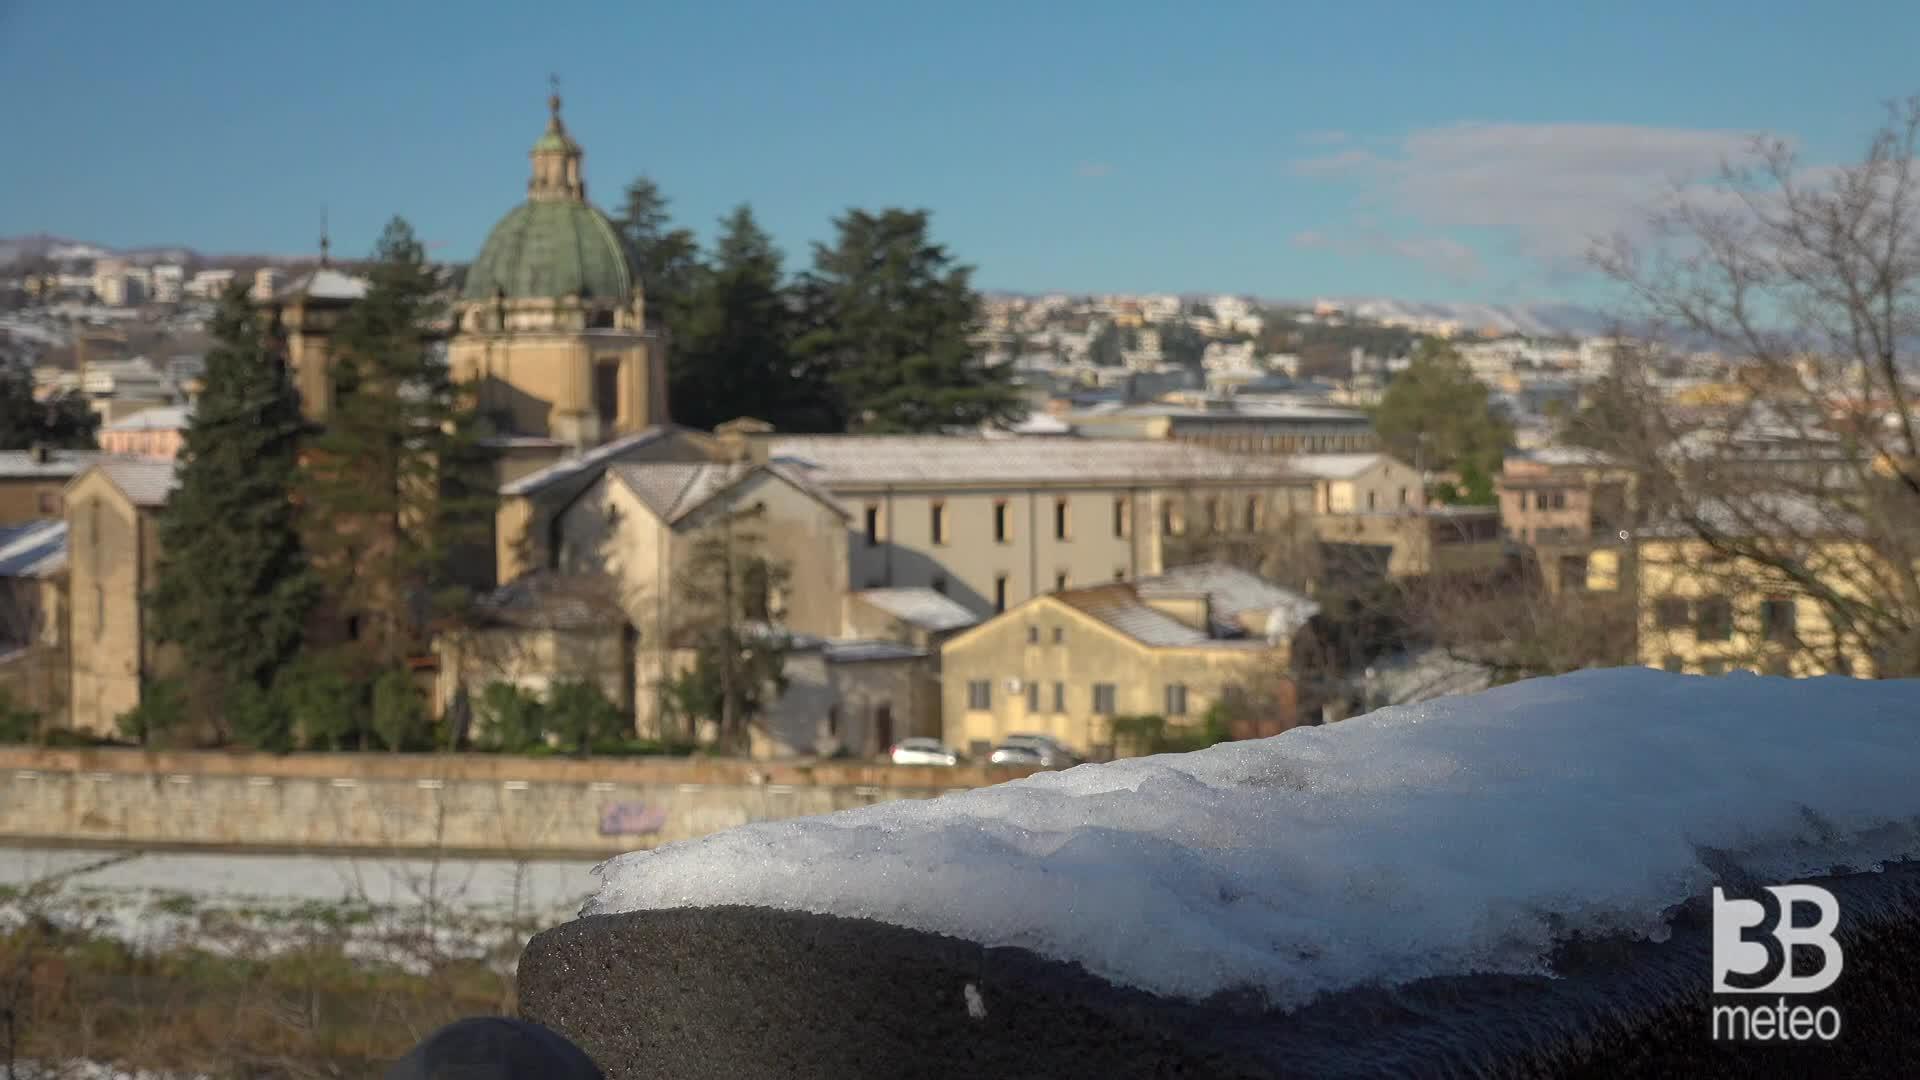 Cosenza la neve imbianca i tetti: le immagini al mattino